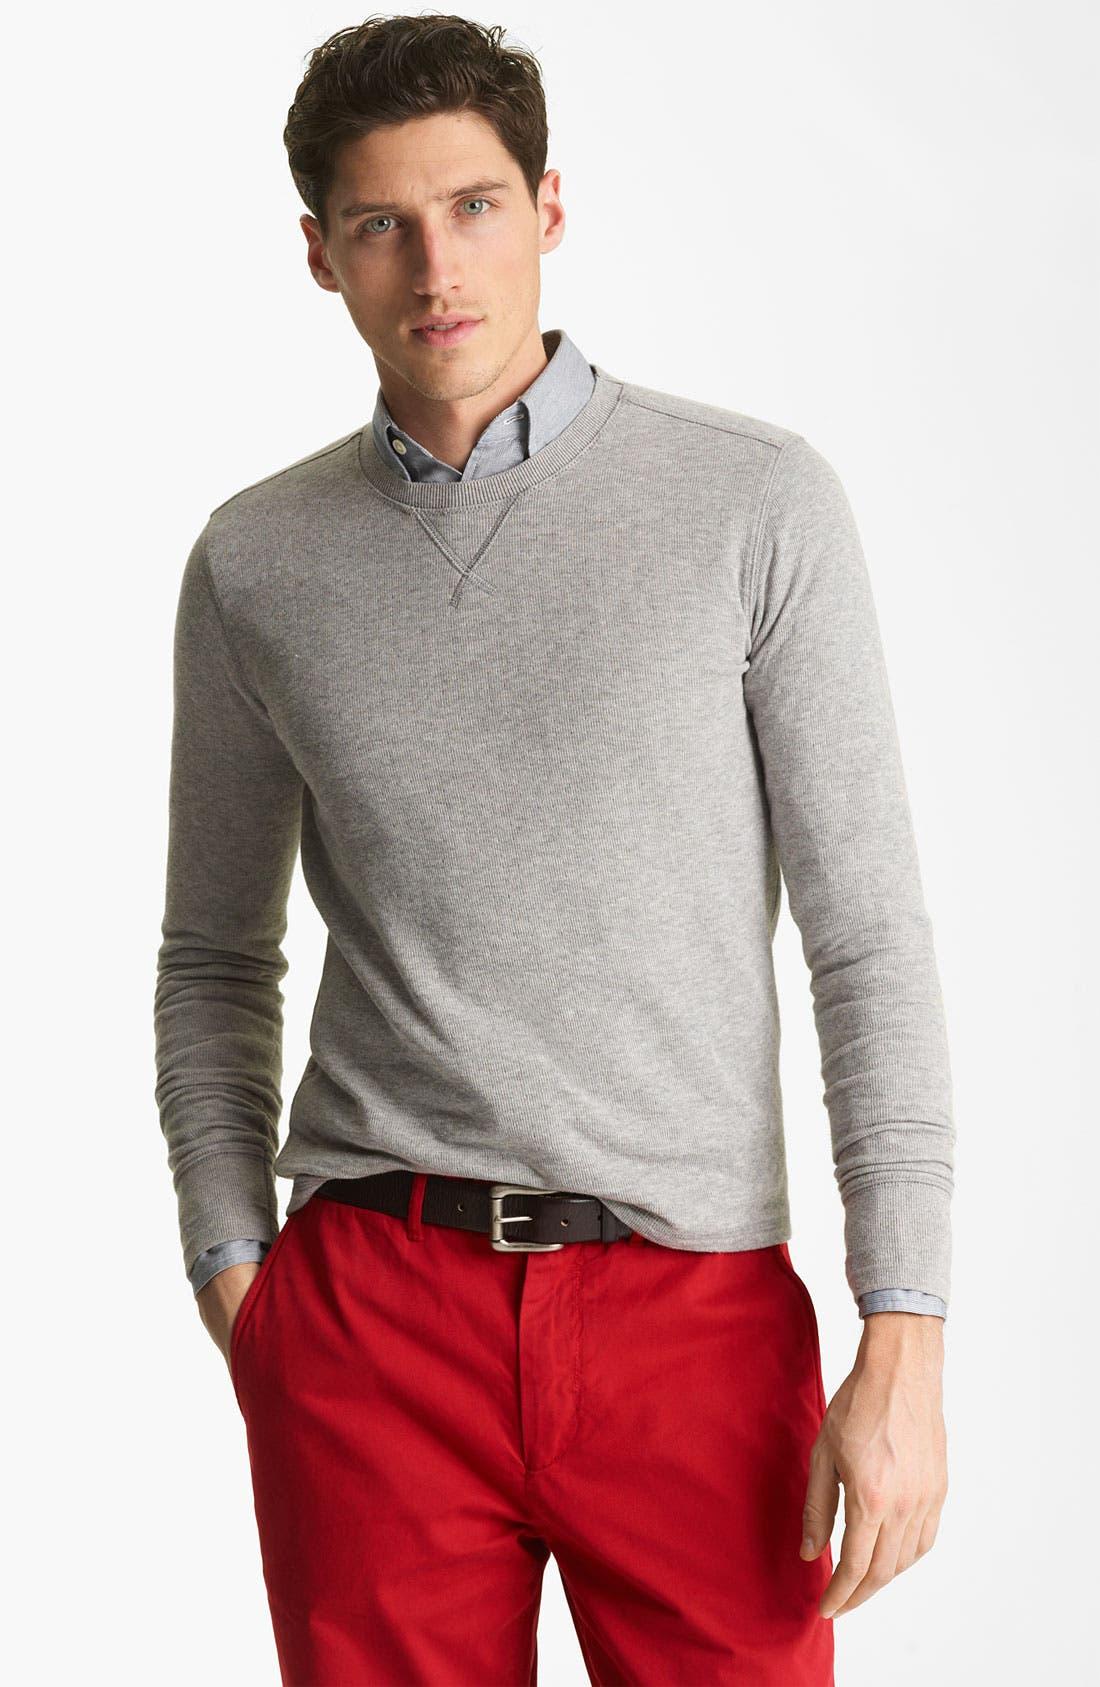 Alternate Image 1 Selected - Jack Spade Dual Layer Sweatshirt